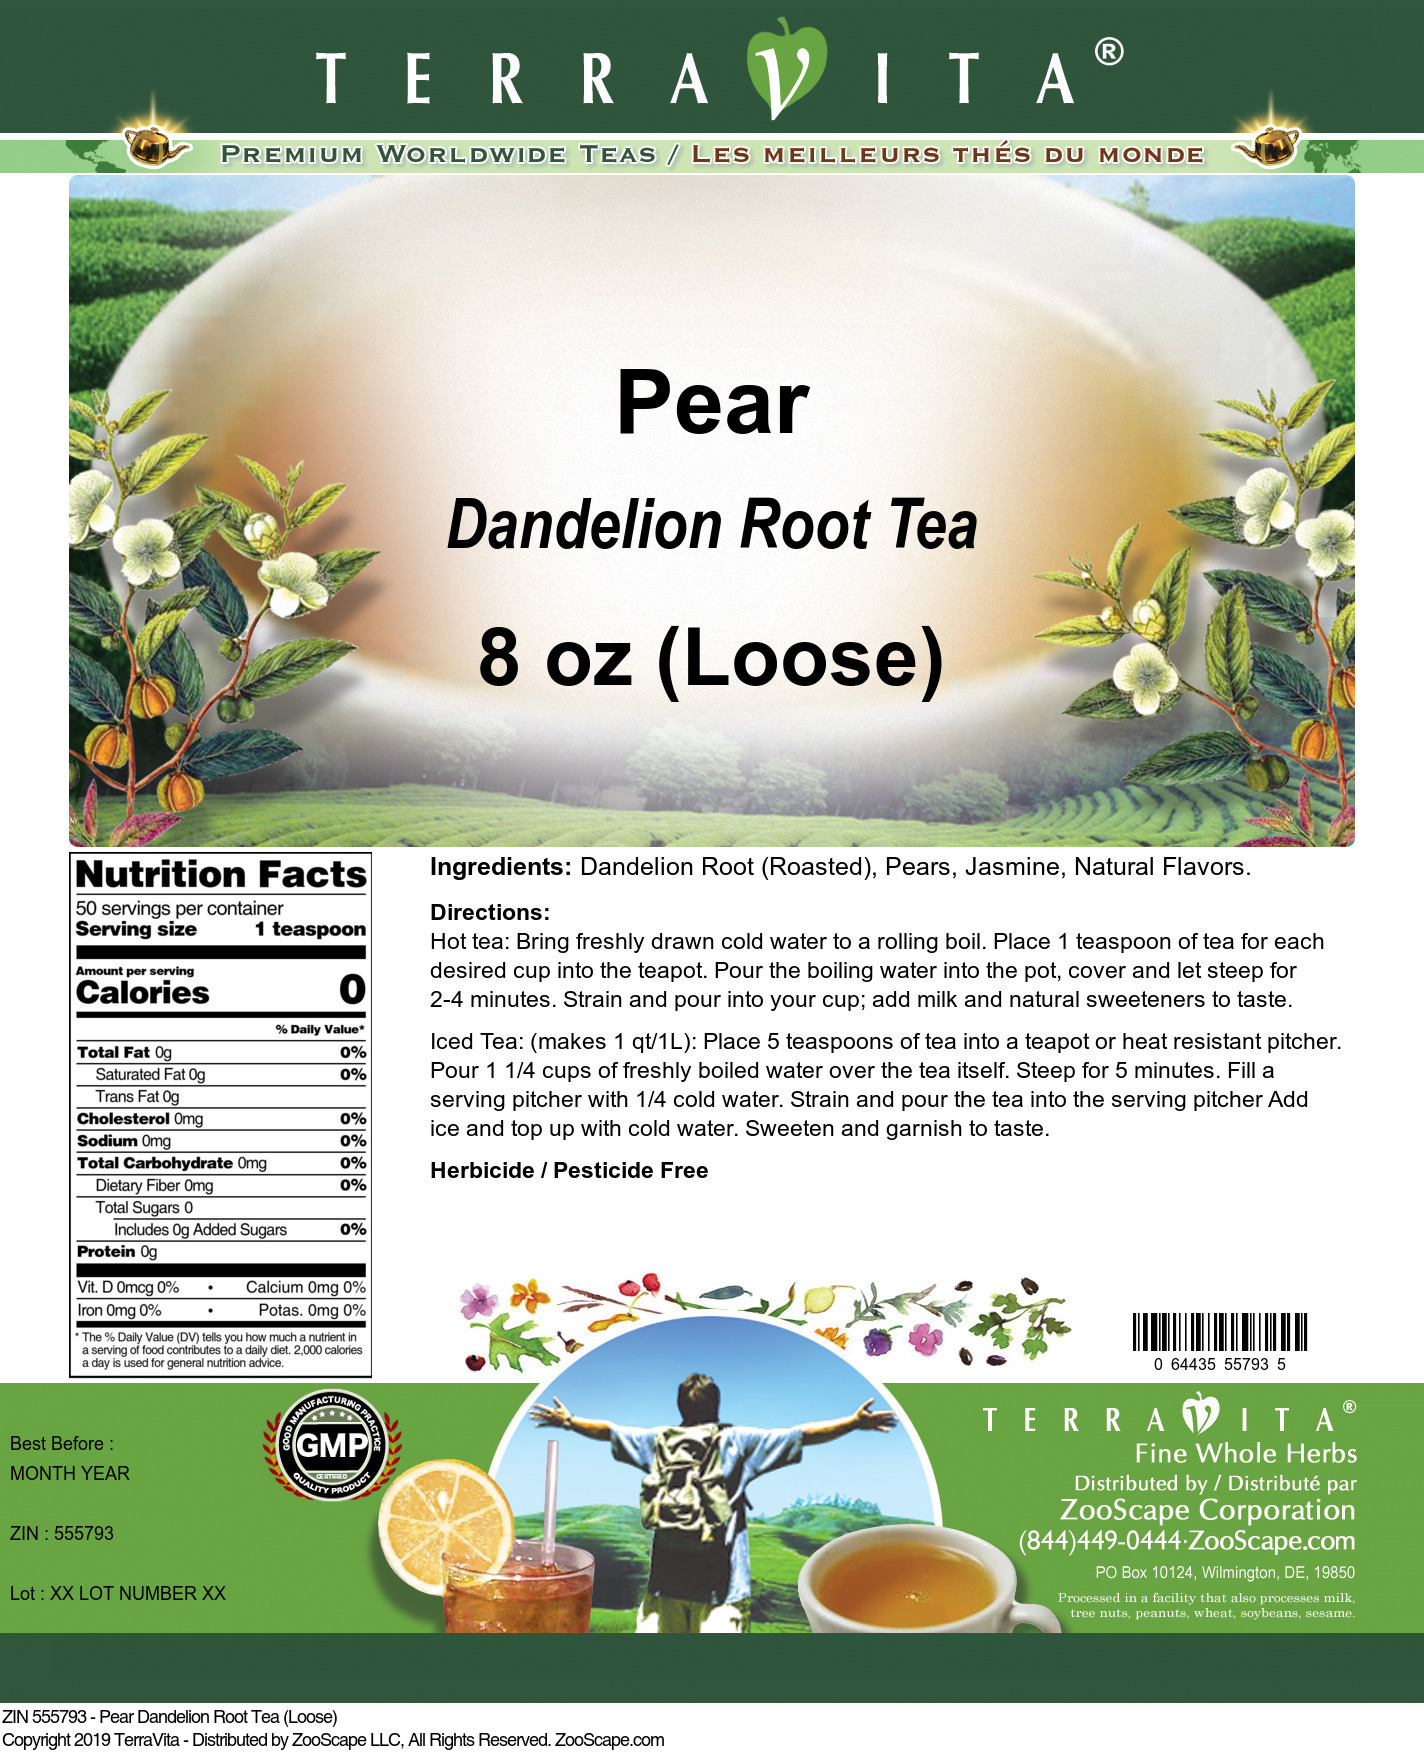 Pear Dandelion Root